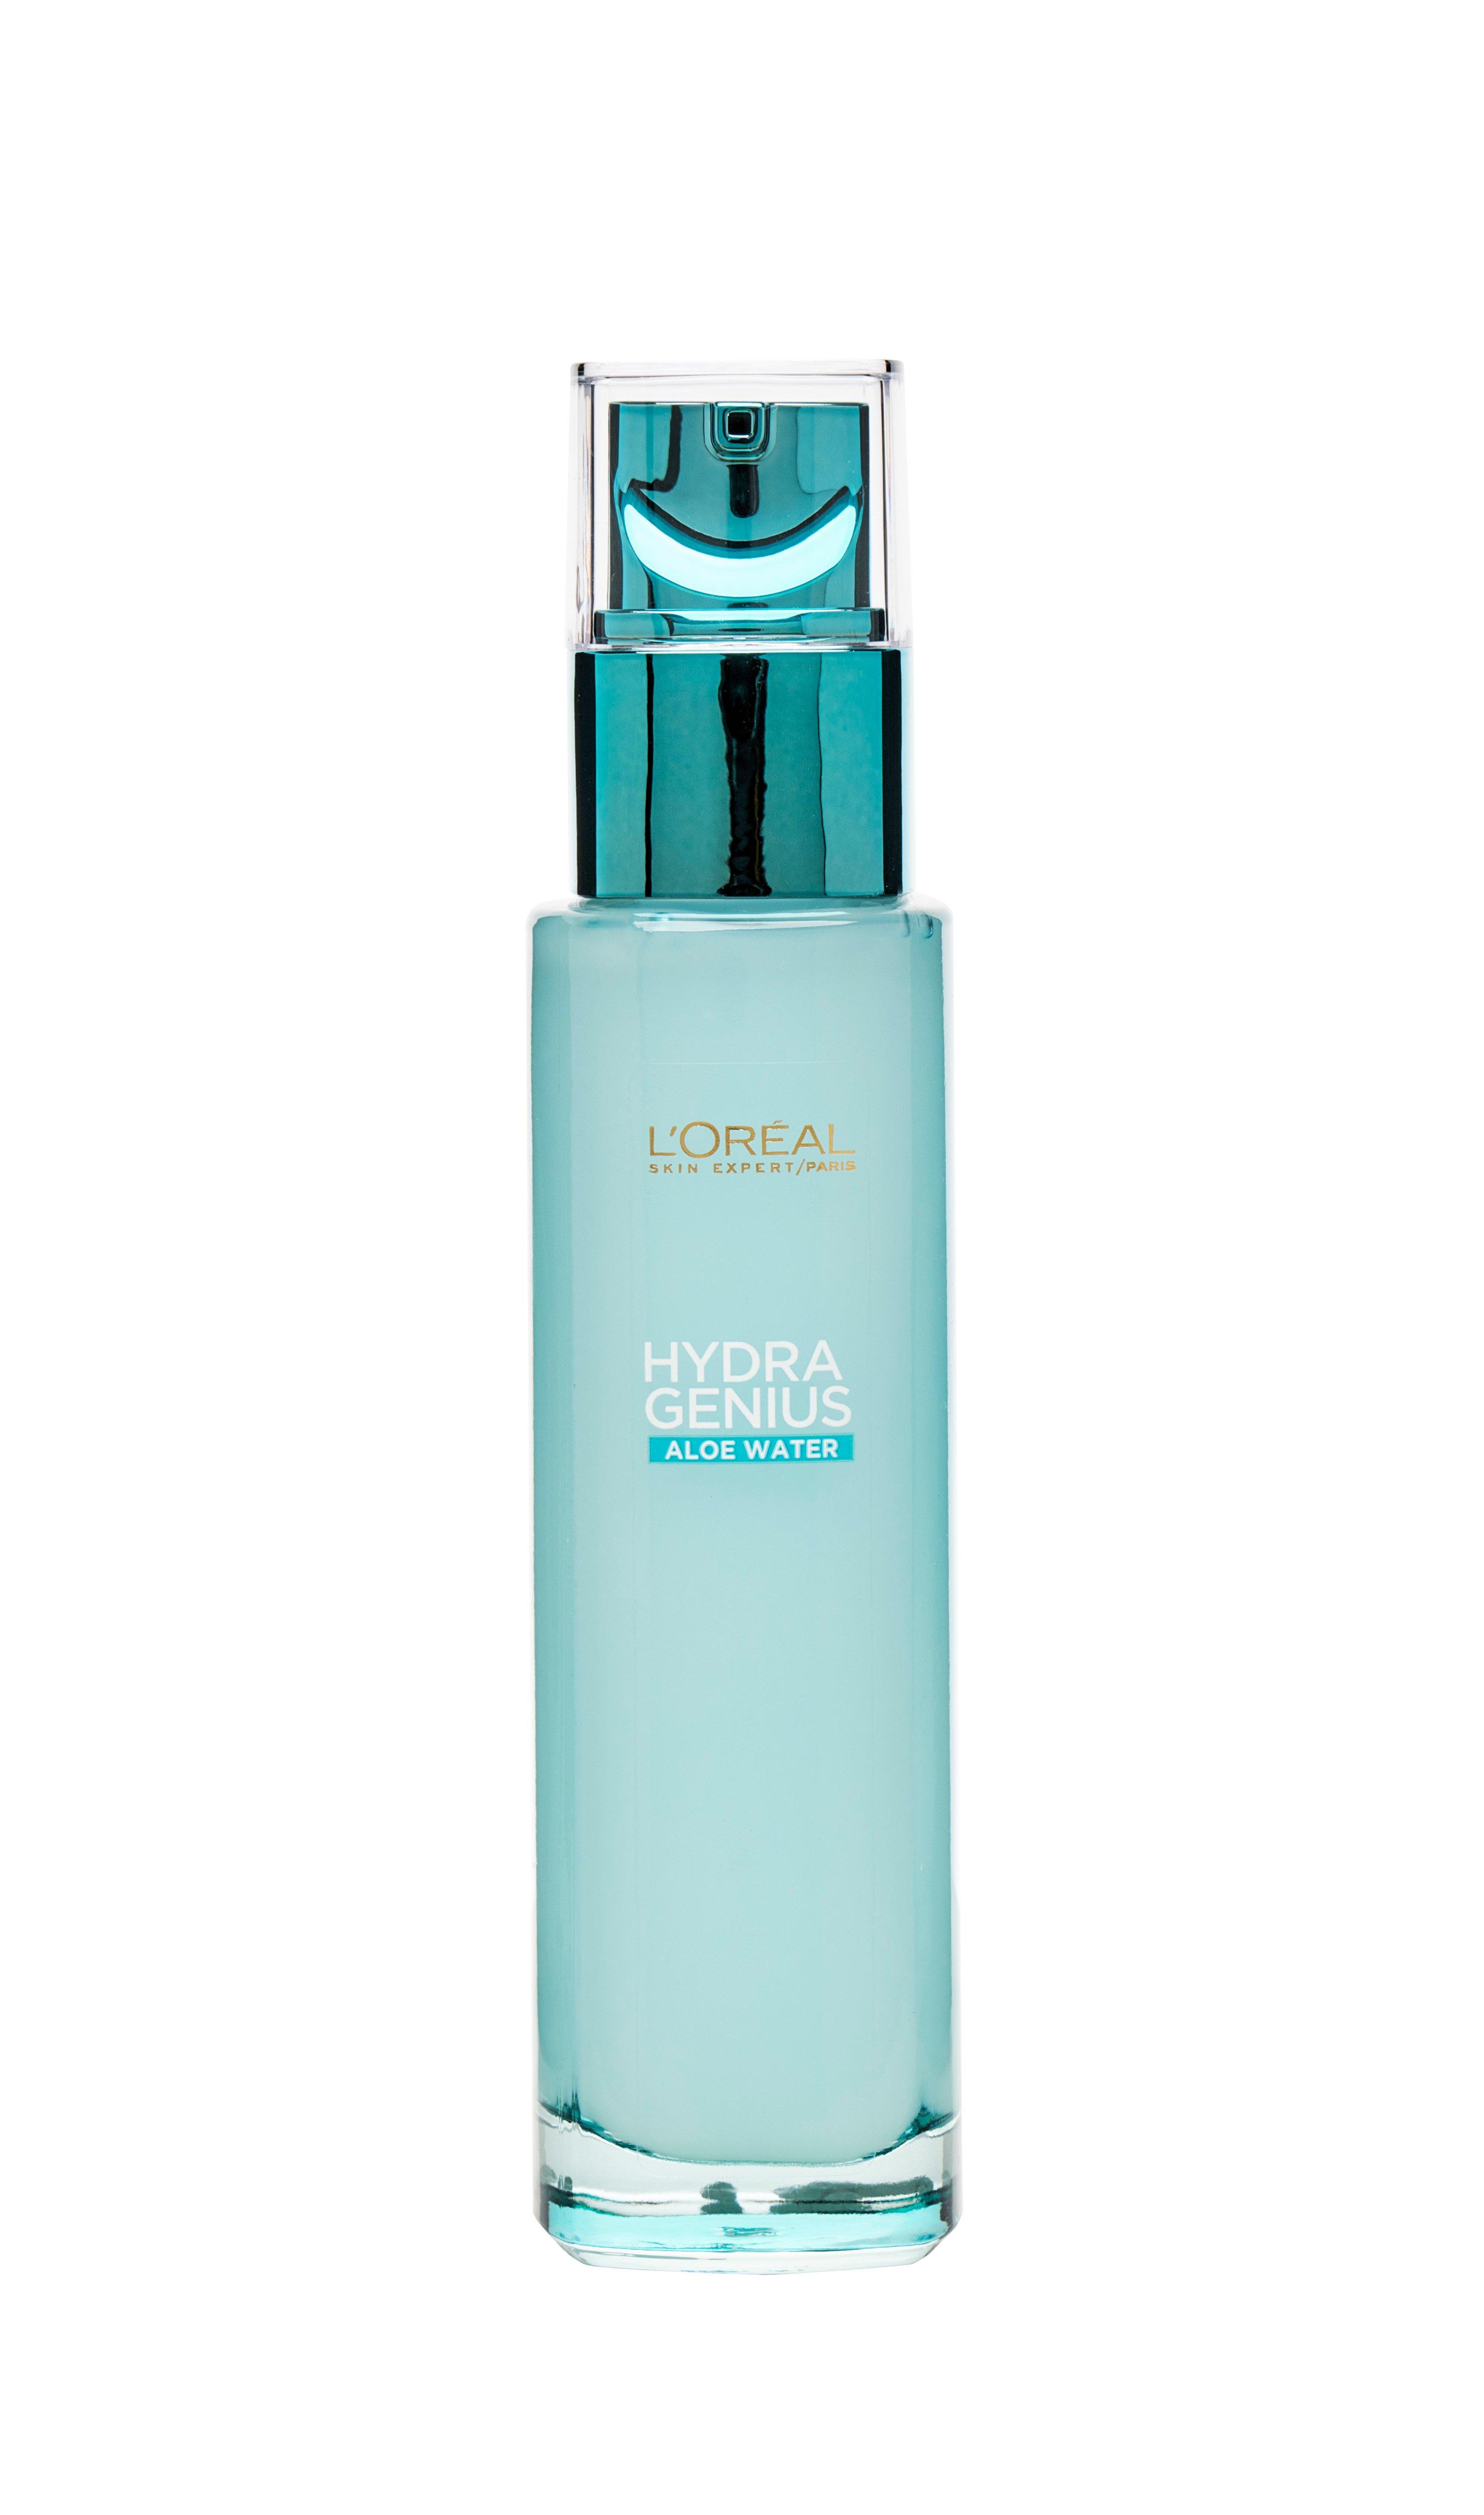 L'Oréal - Hydra Genius Oily skin 70 ml